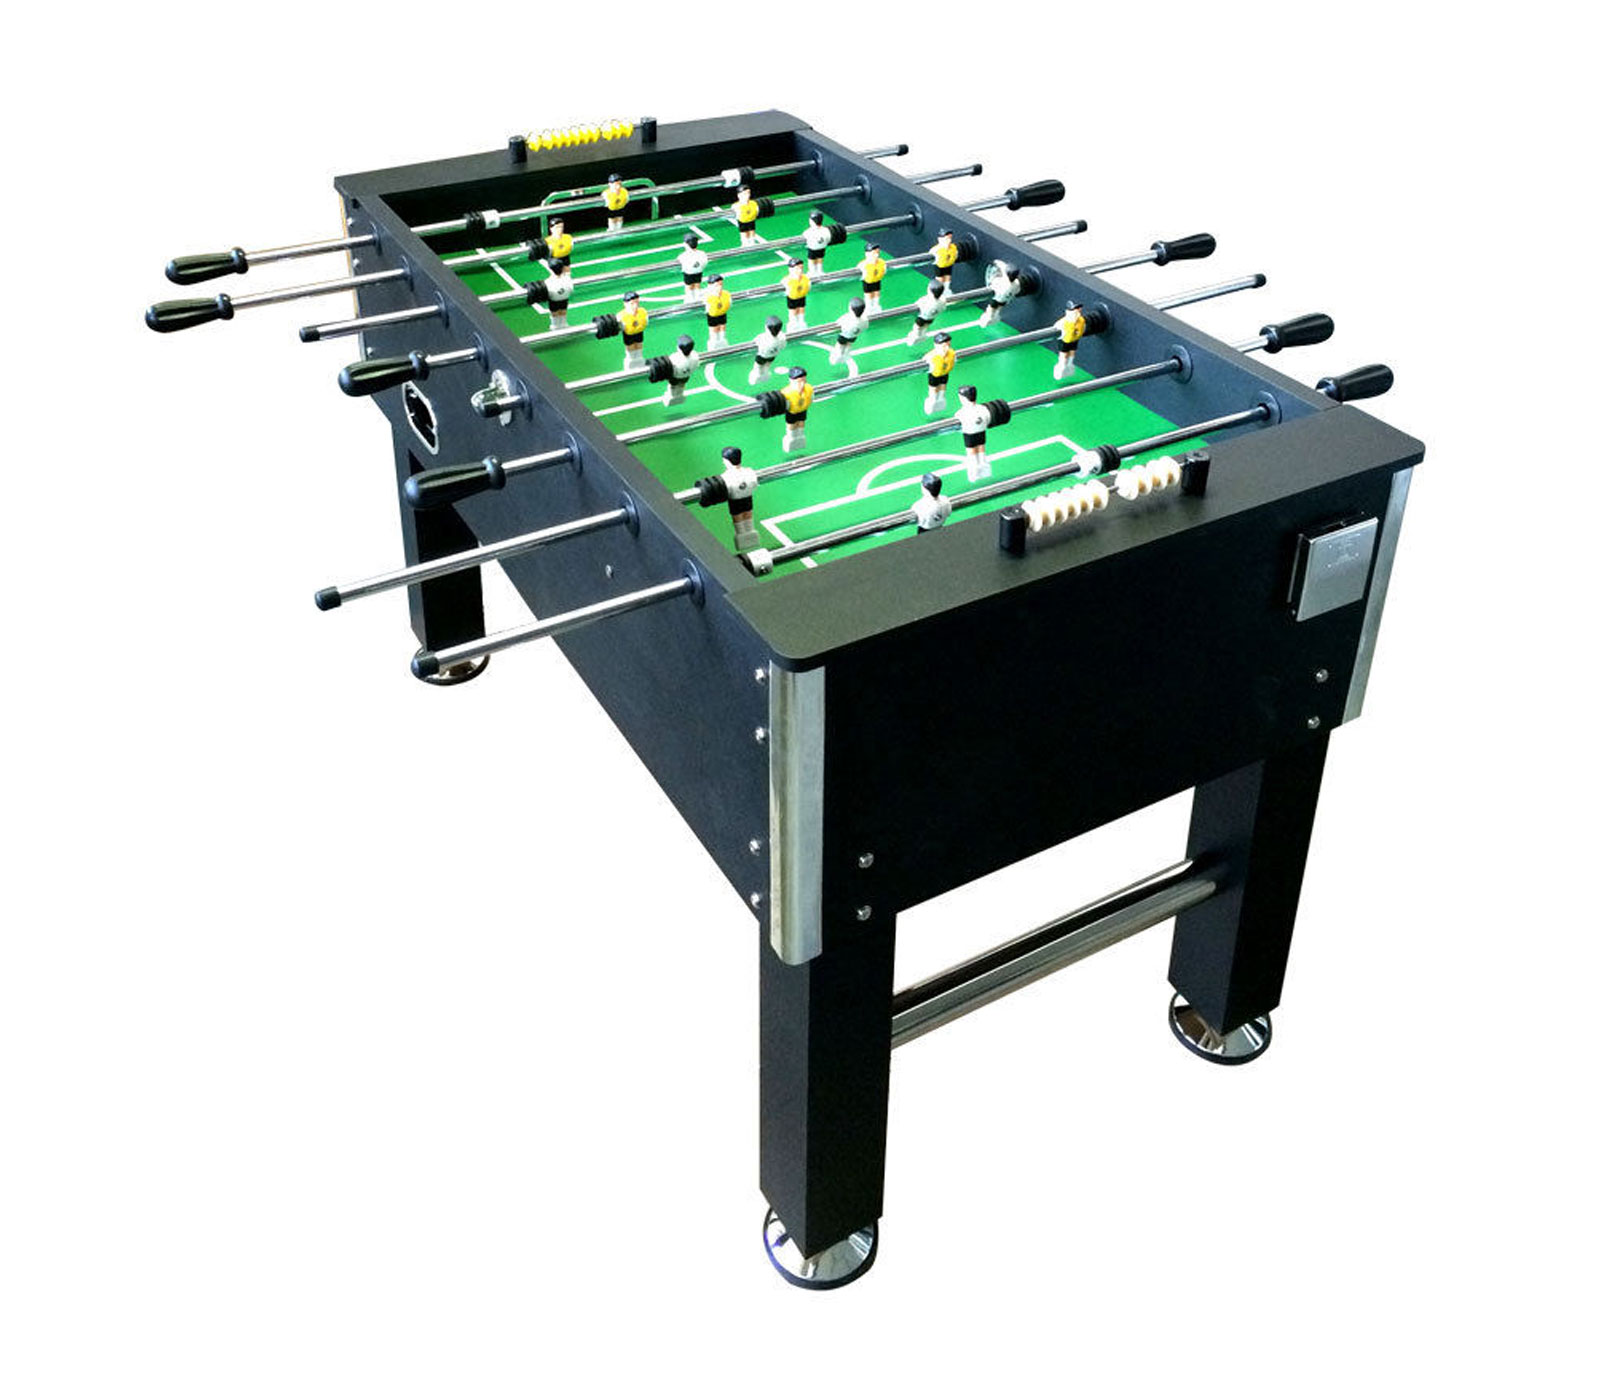 football-table-top-class-1